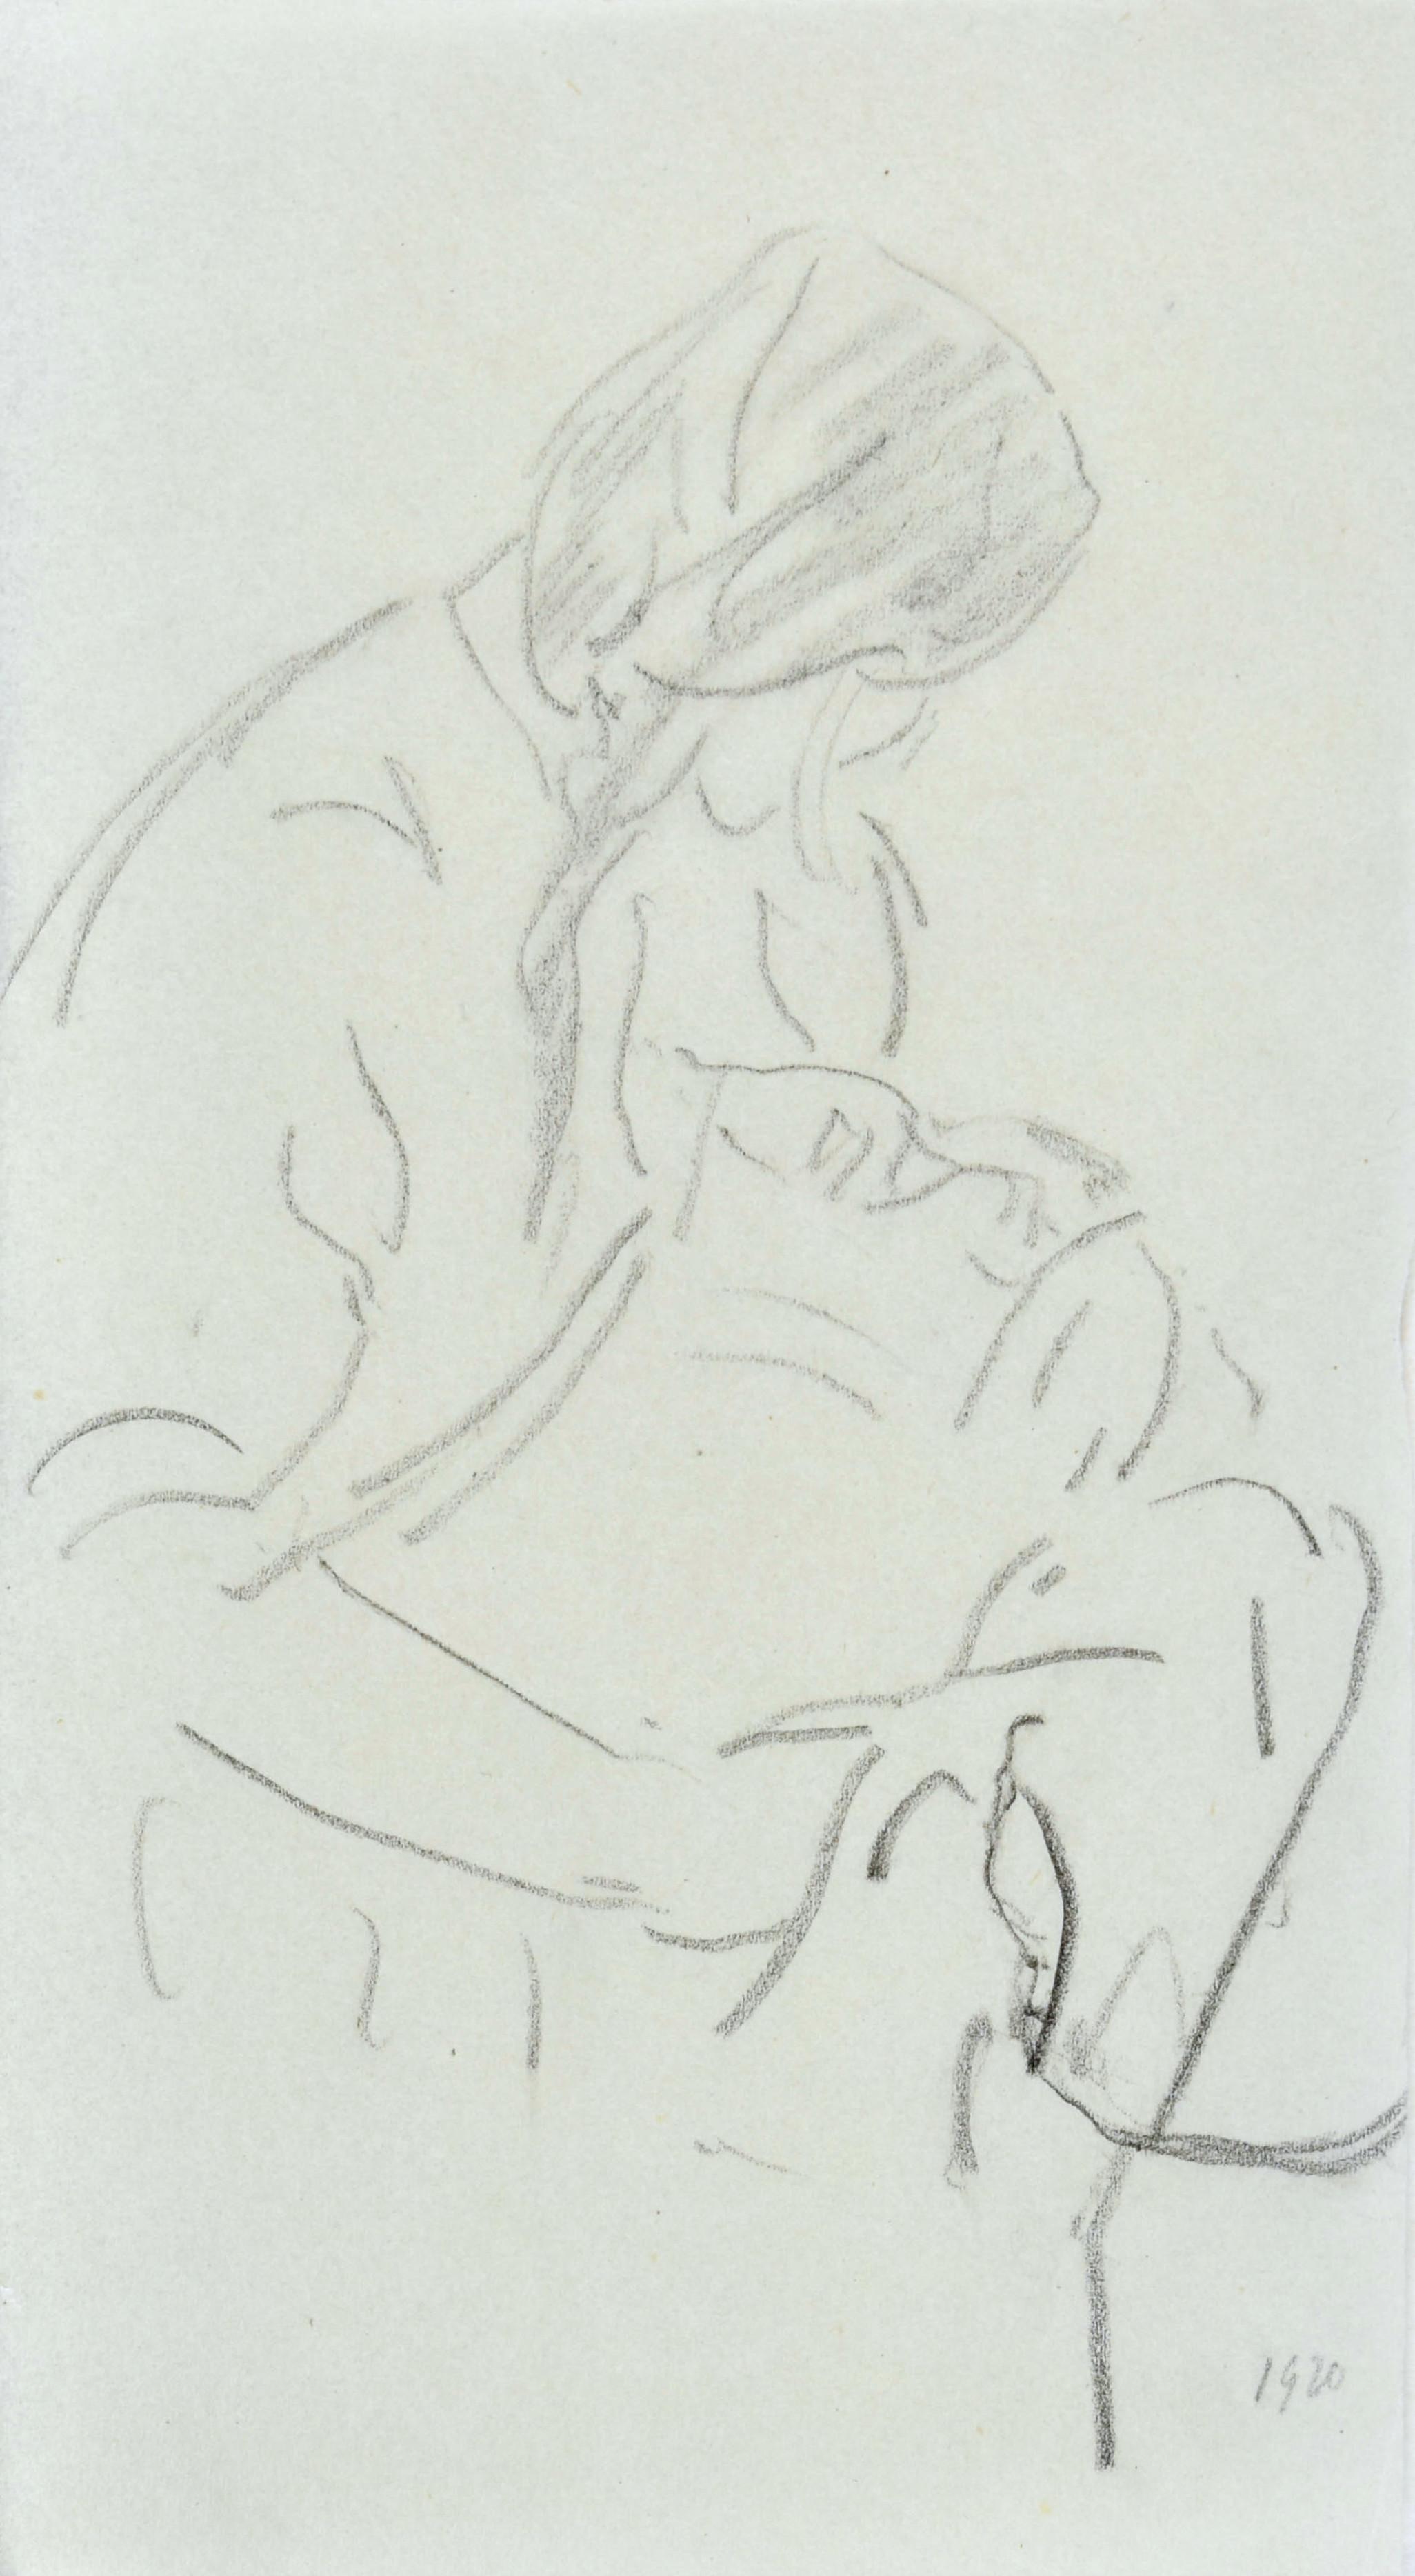 Kobieta z niemowlęciem, 1920